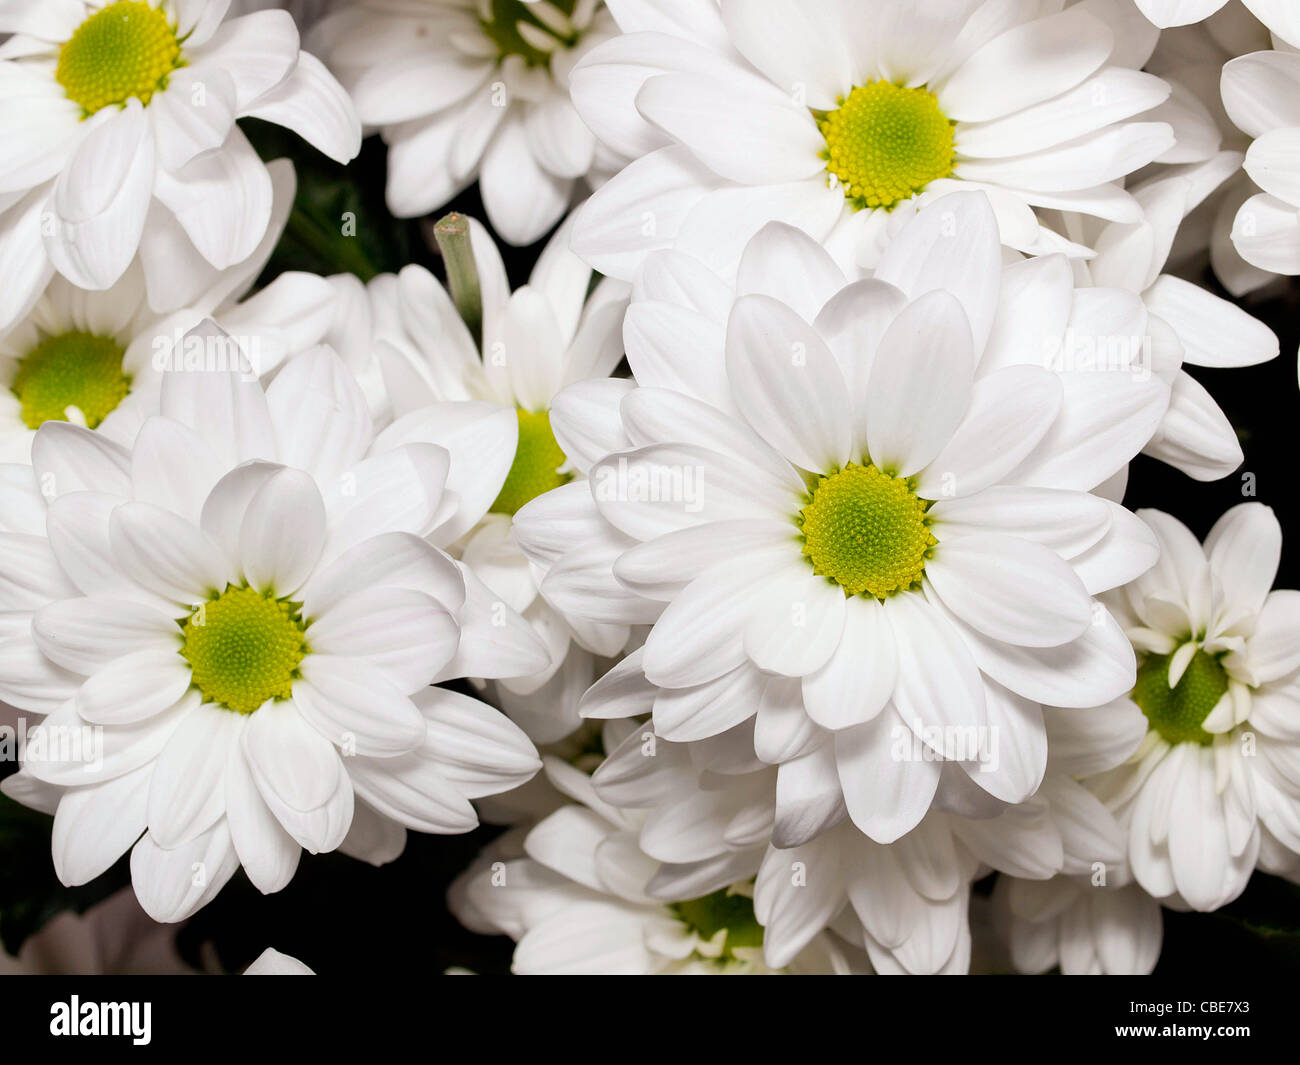 White Chrysanthemum Flowers Stock Photos White Chrysanthemum